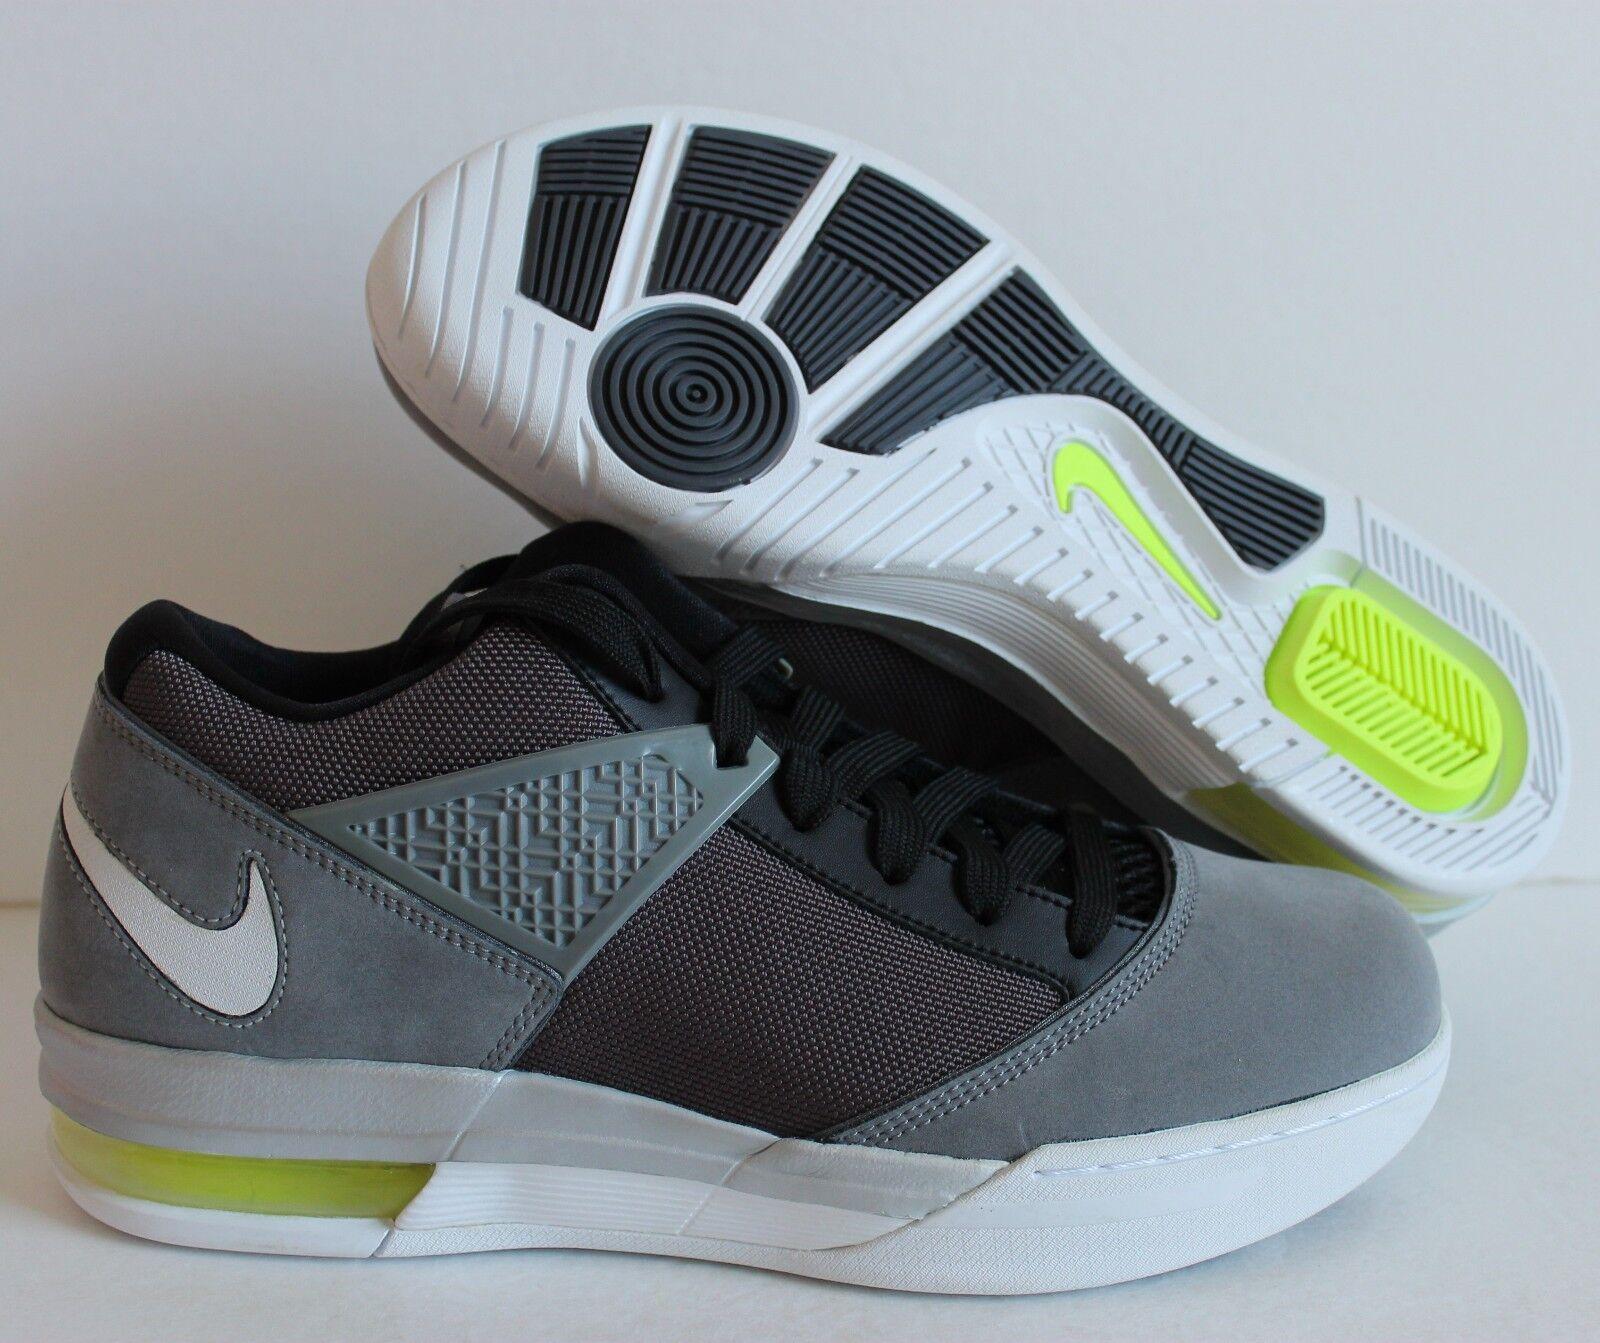 Nike Zoom LBJ LBJ LBJ Lebron James Ambassador III SZ 9 [415142-004] fd1a17